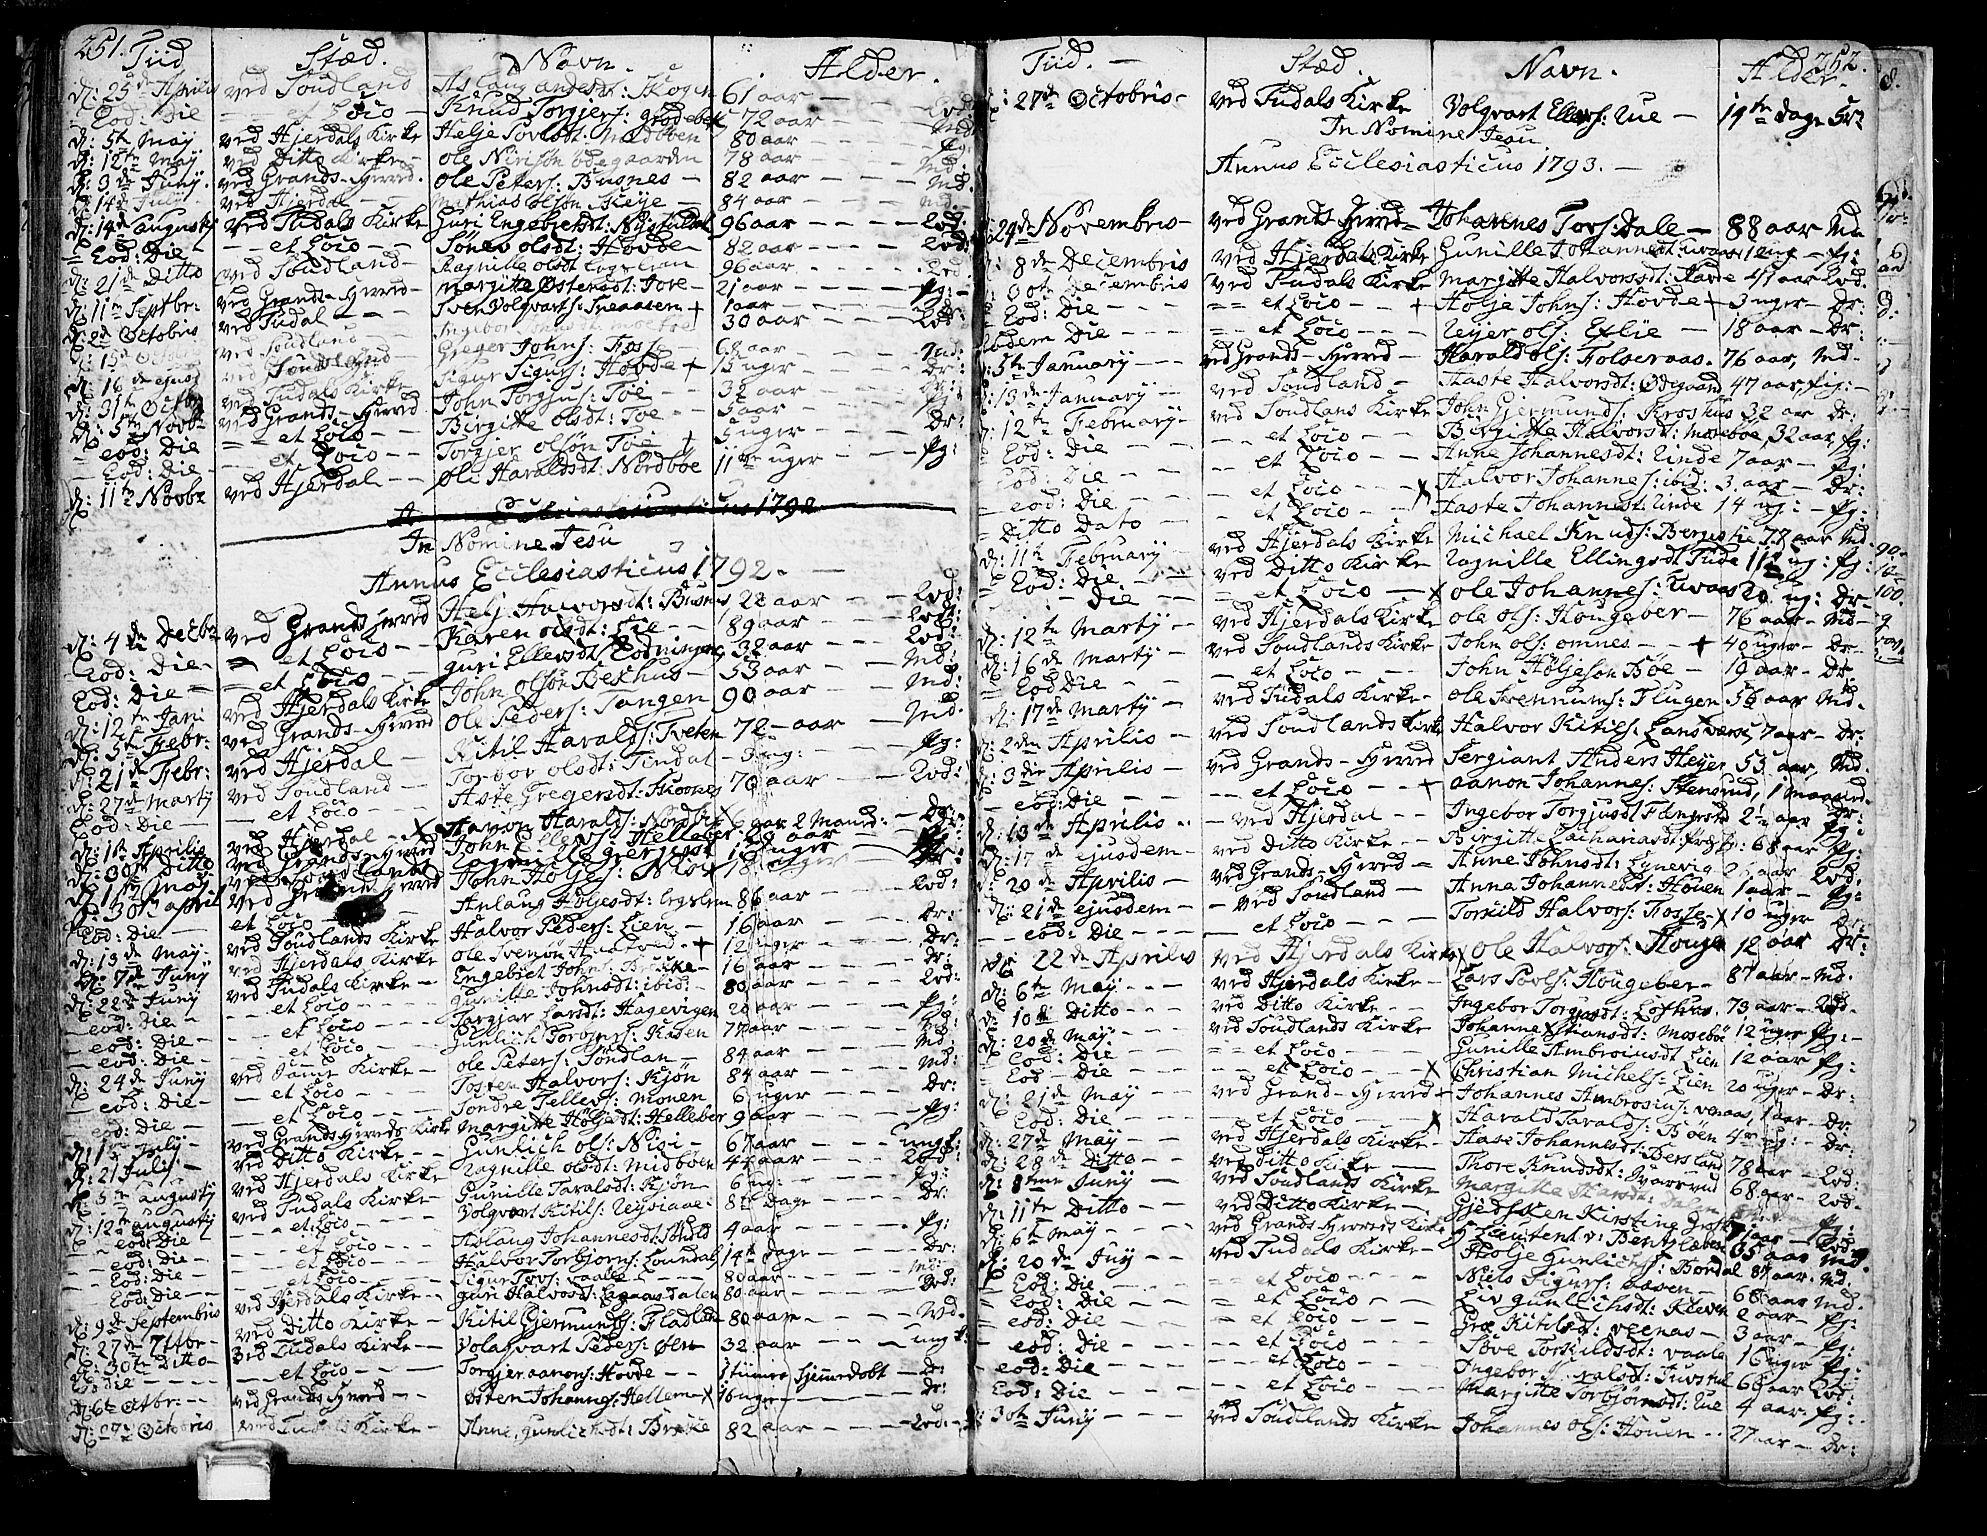 SAKO, Hjartdal kirkebøker, F/Fa/L0005: Ministerialbok nr. I 5, 1776-1801, s. 251-252